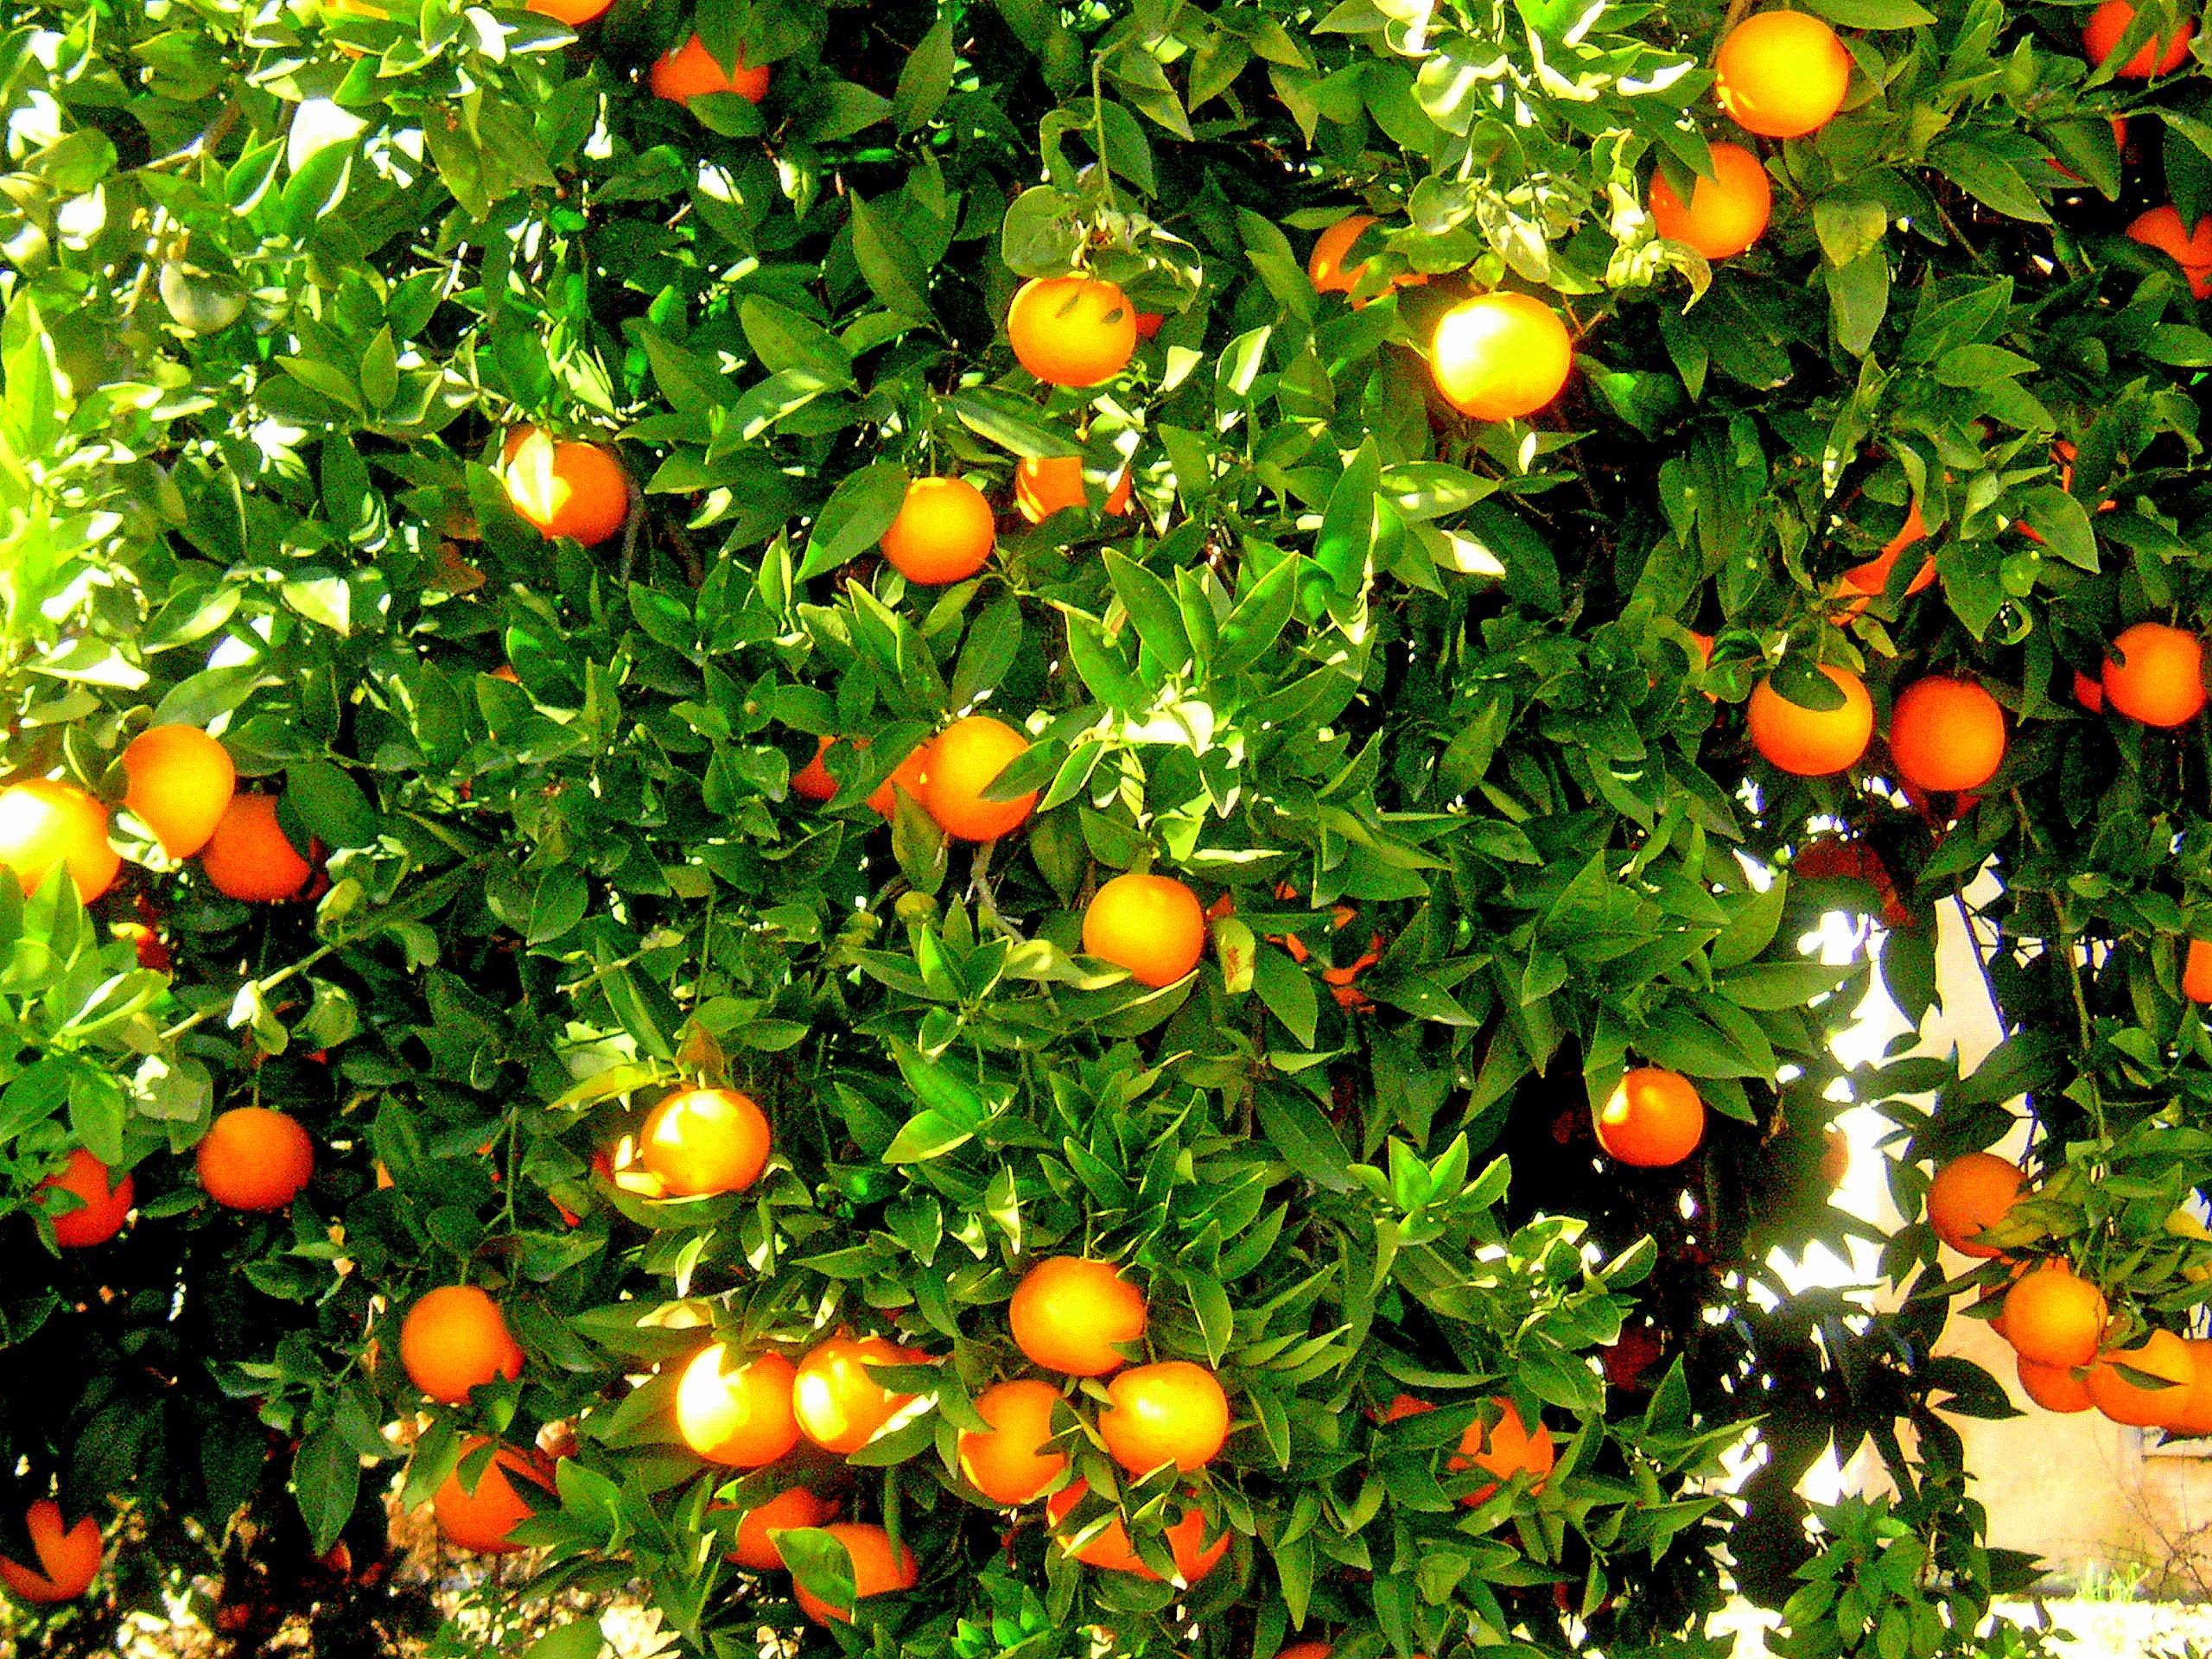 Free images flower orange tree food produce for Plante orange